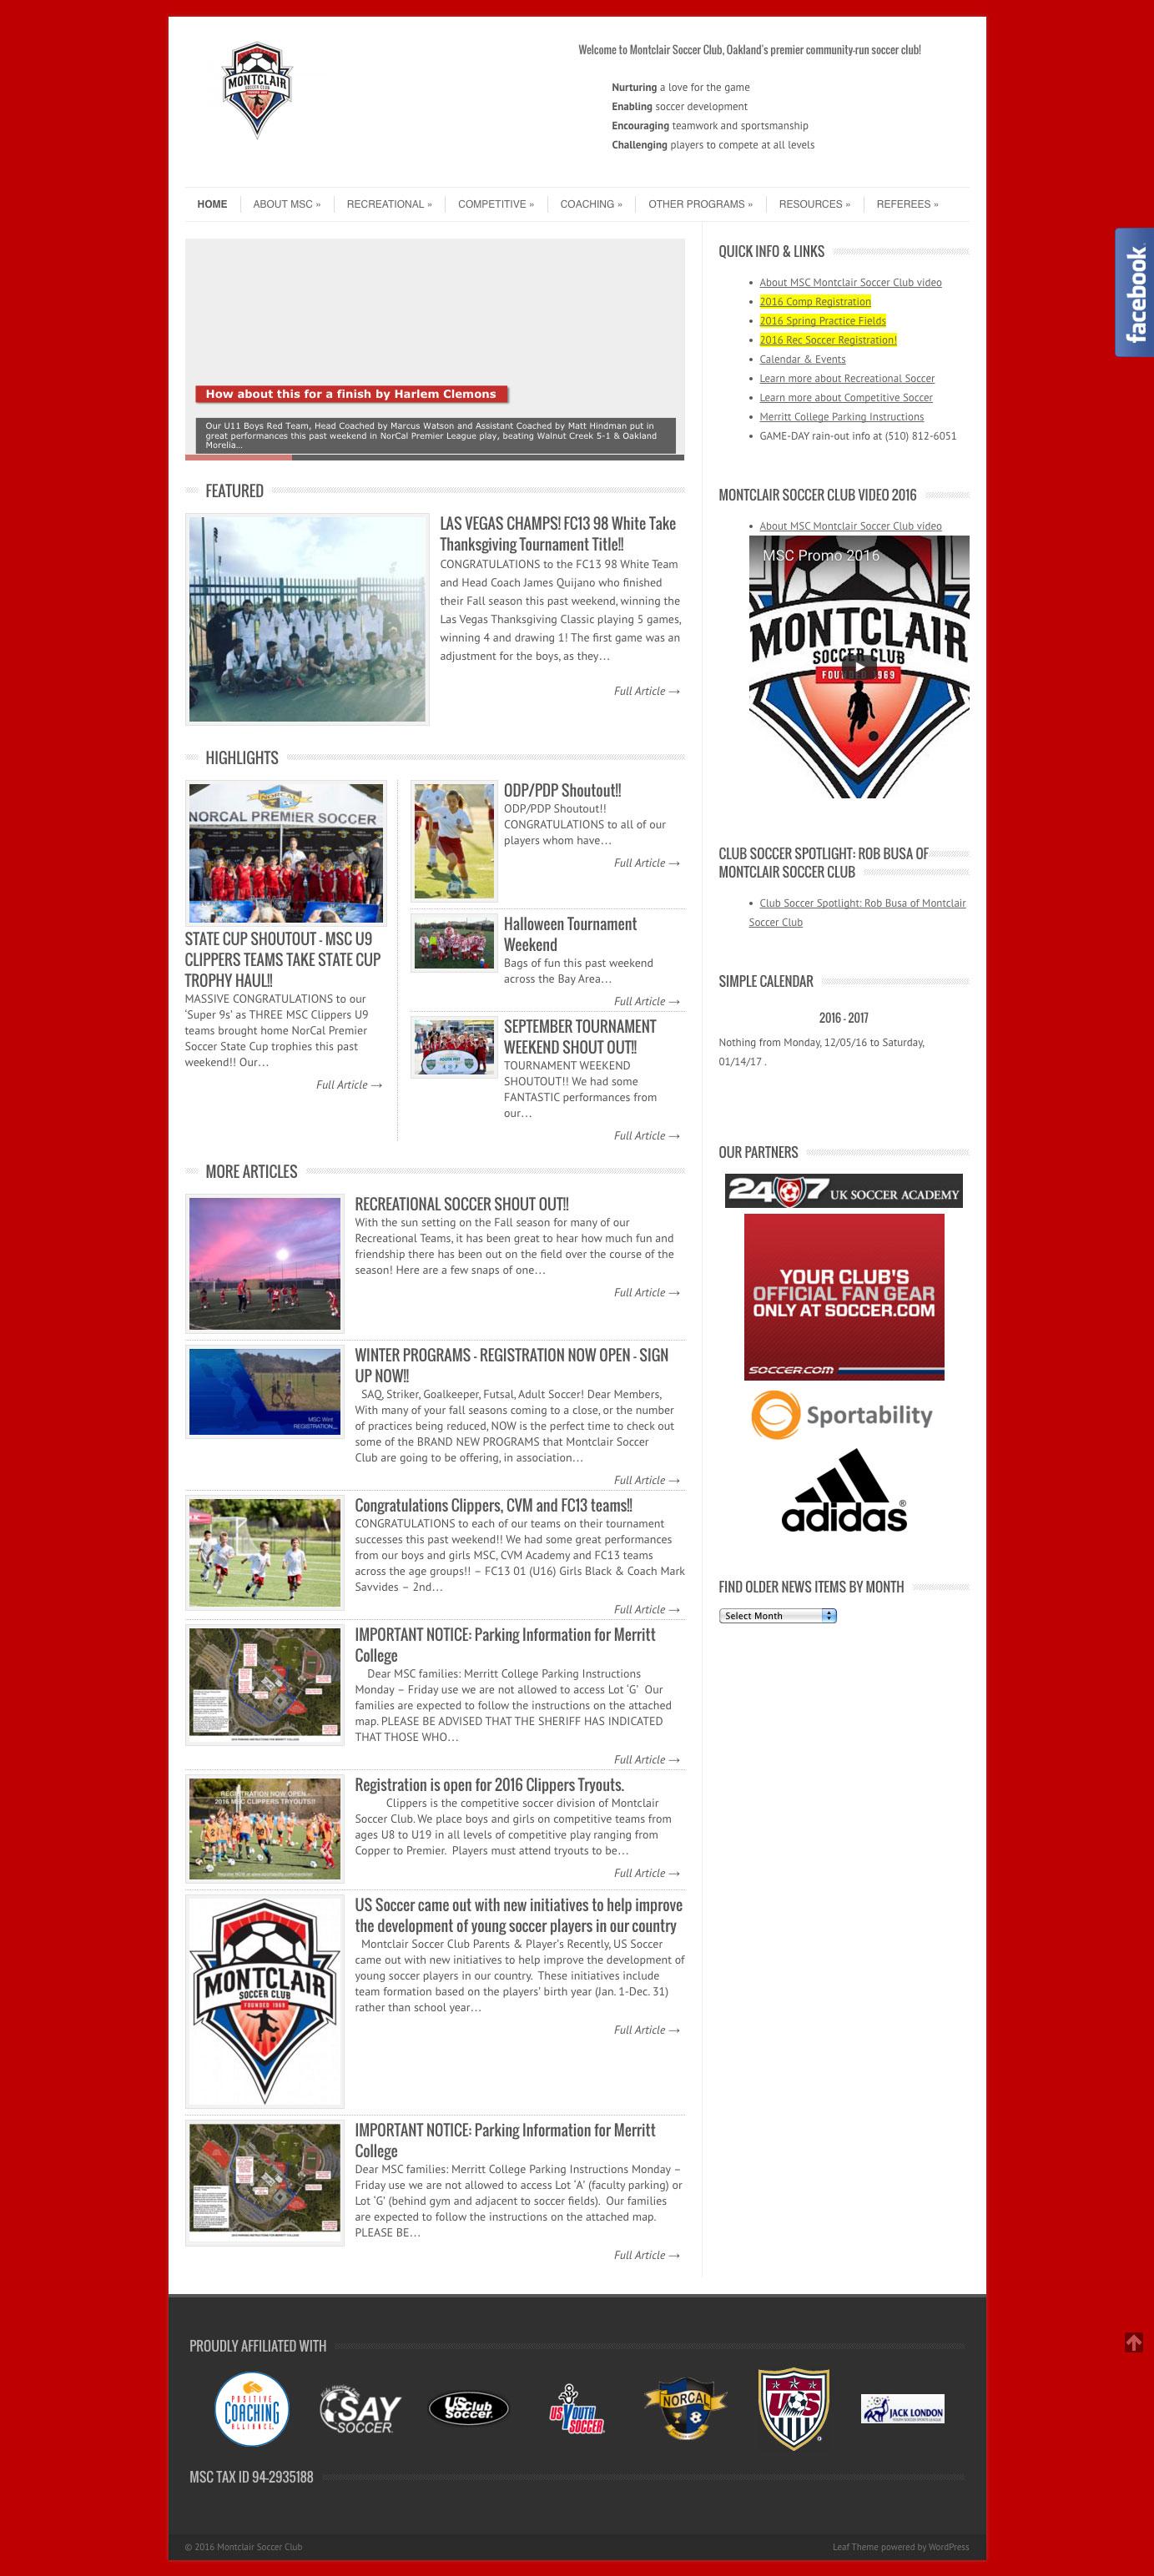 montclair-soccer-club-website-old